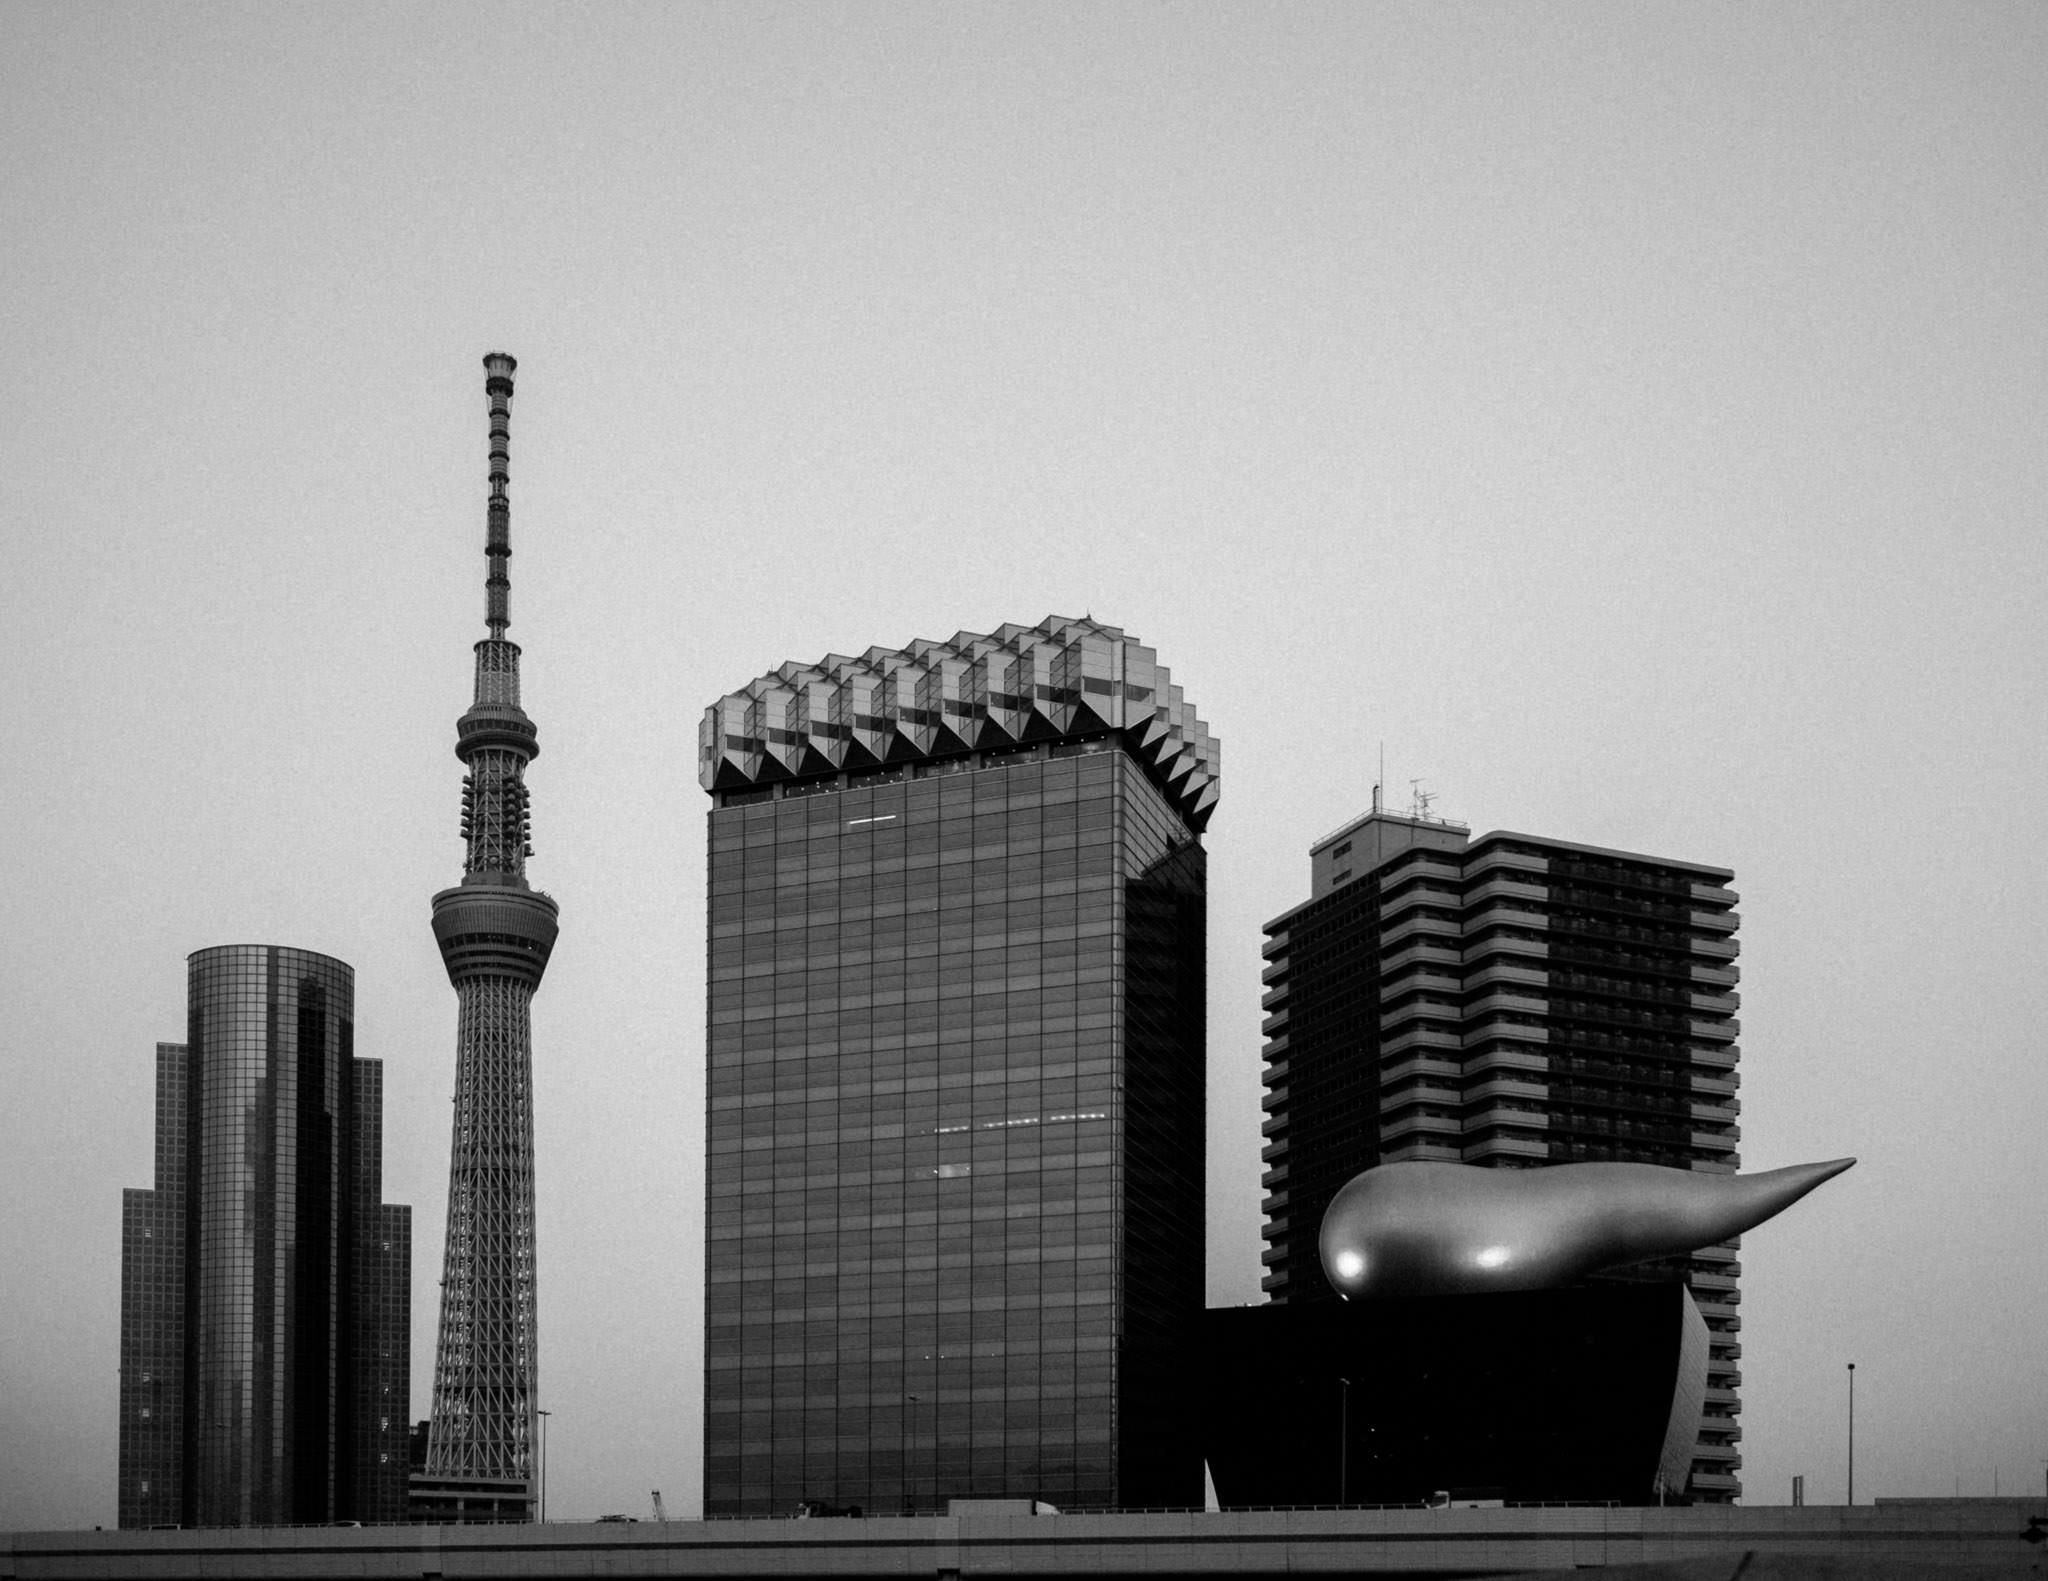 chris_eberhardt_japan_travel_reise_nippon-68.jpg